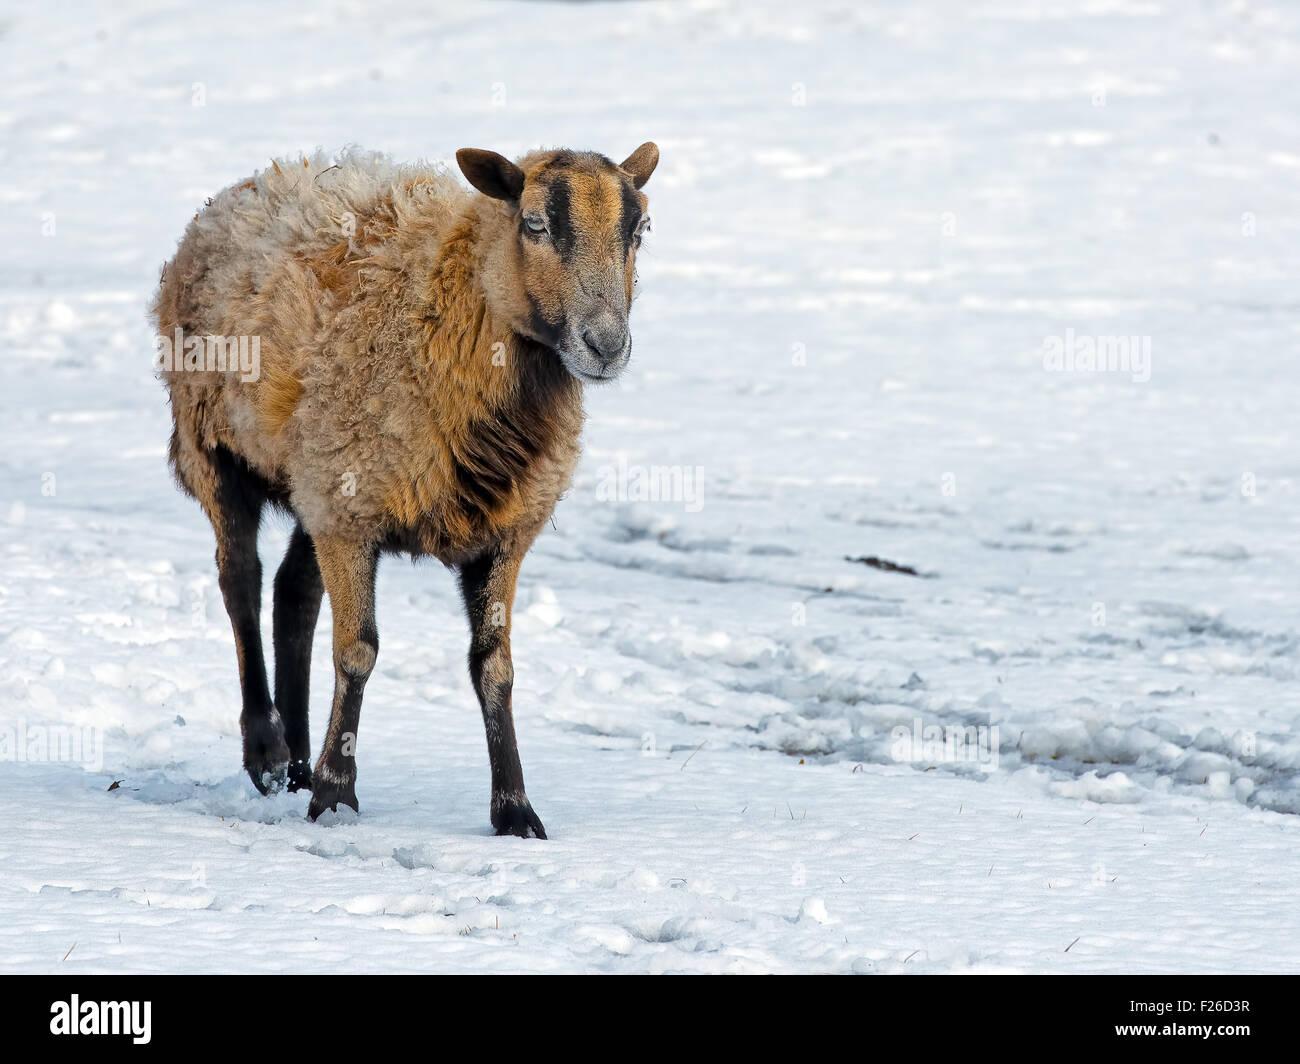 Sheep Ewe walking in the snow - Stock Image